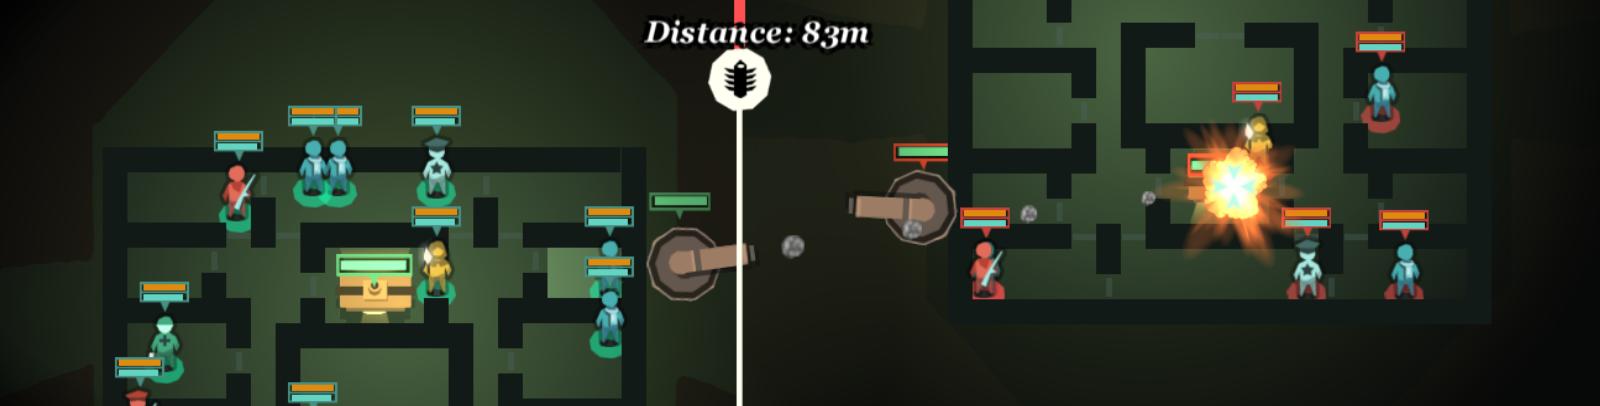 Tense turn-based combat